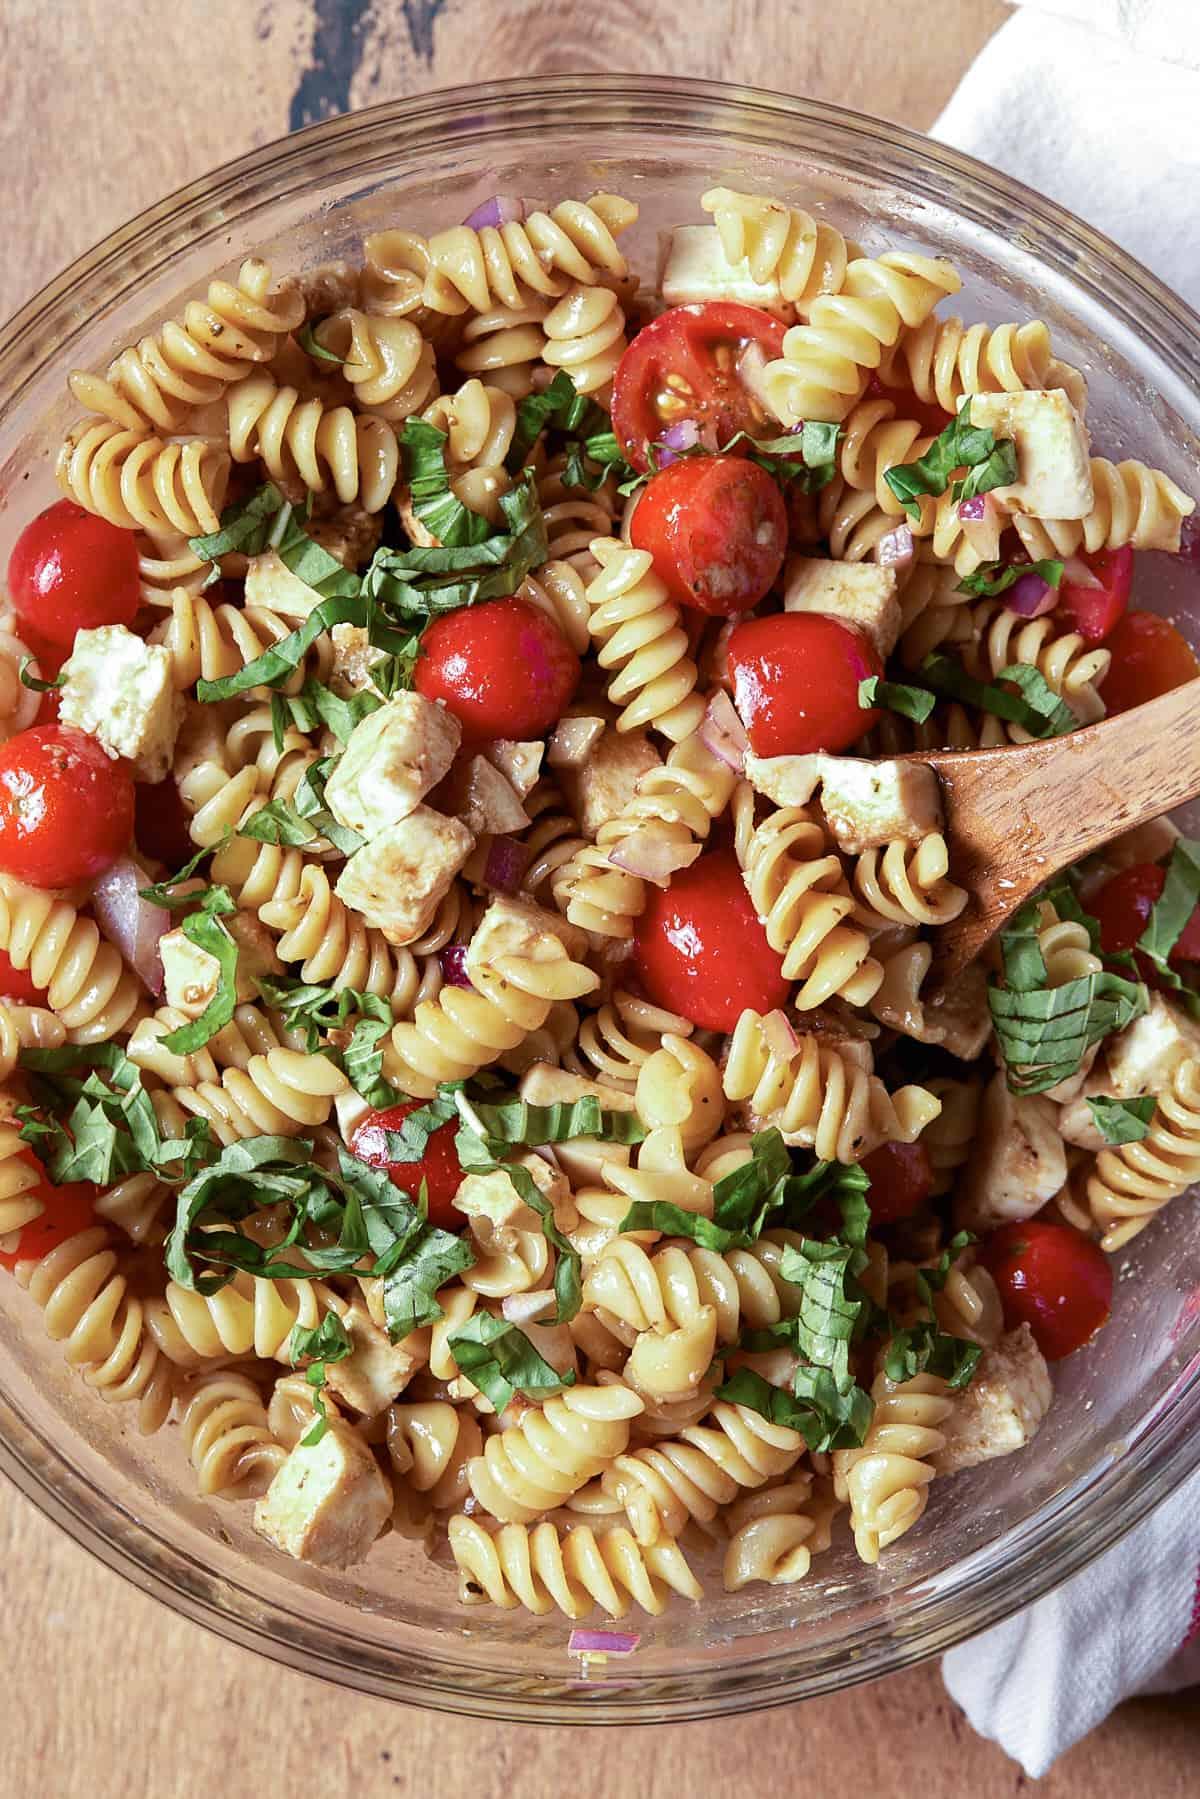 Caprese pasta salad in a glass bowl.